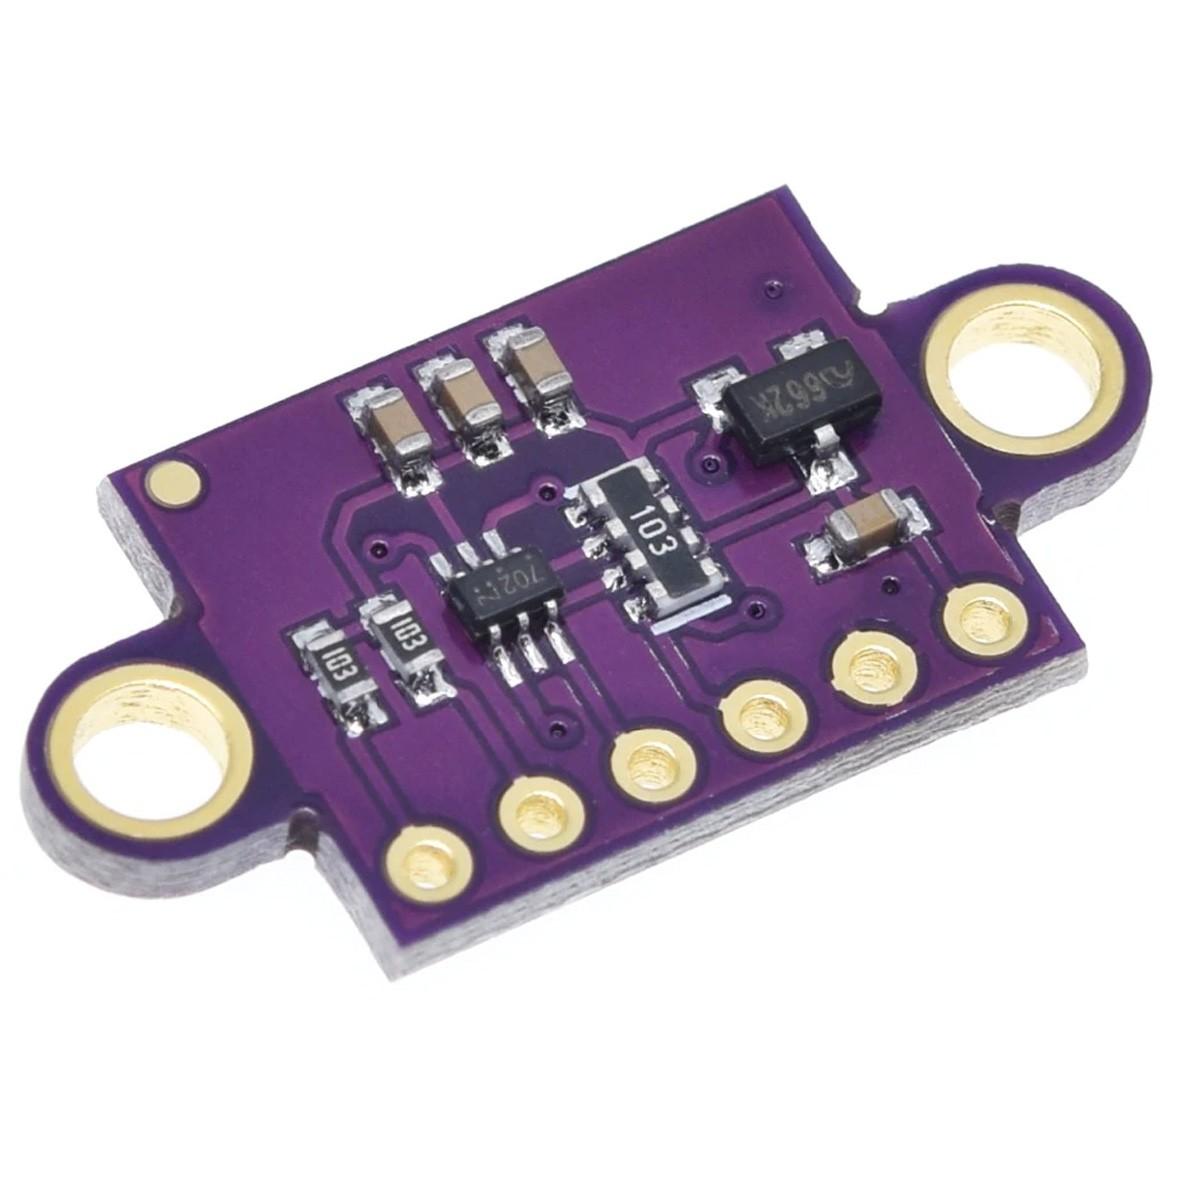 Módulo Sensor De Distancia Laser Vl53l0x